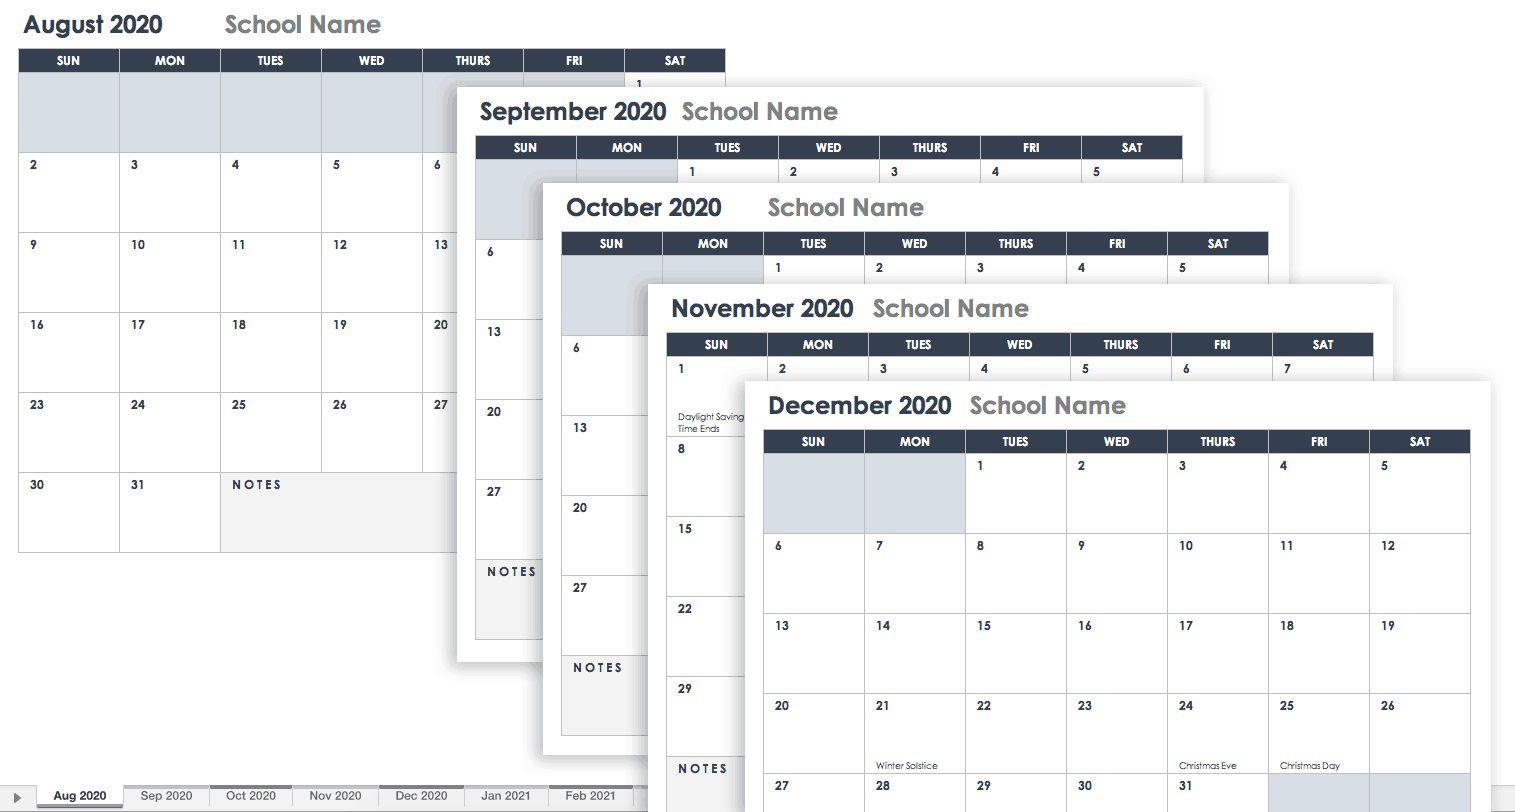 005 Exceptional Google Doc Calendar Template 2020 Image  Drive Sheet WeeklyFull